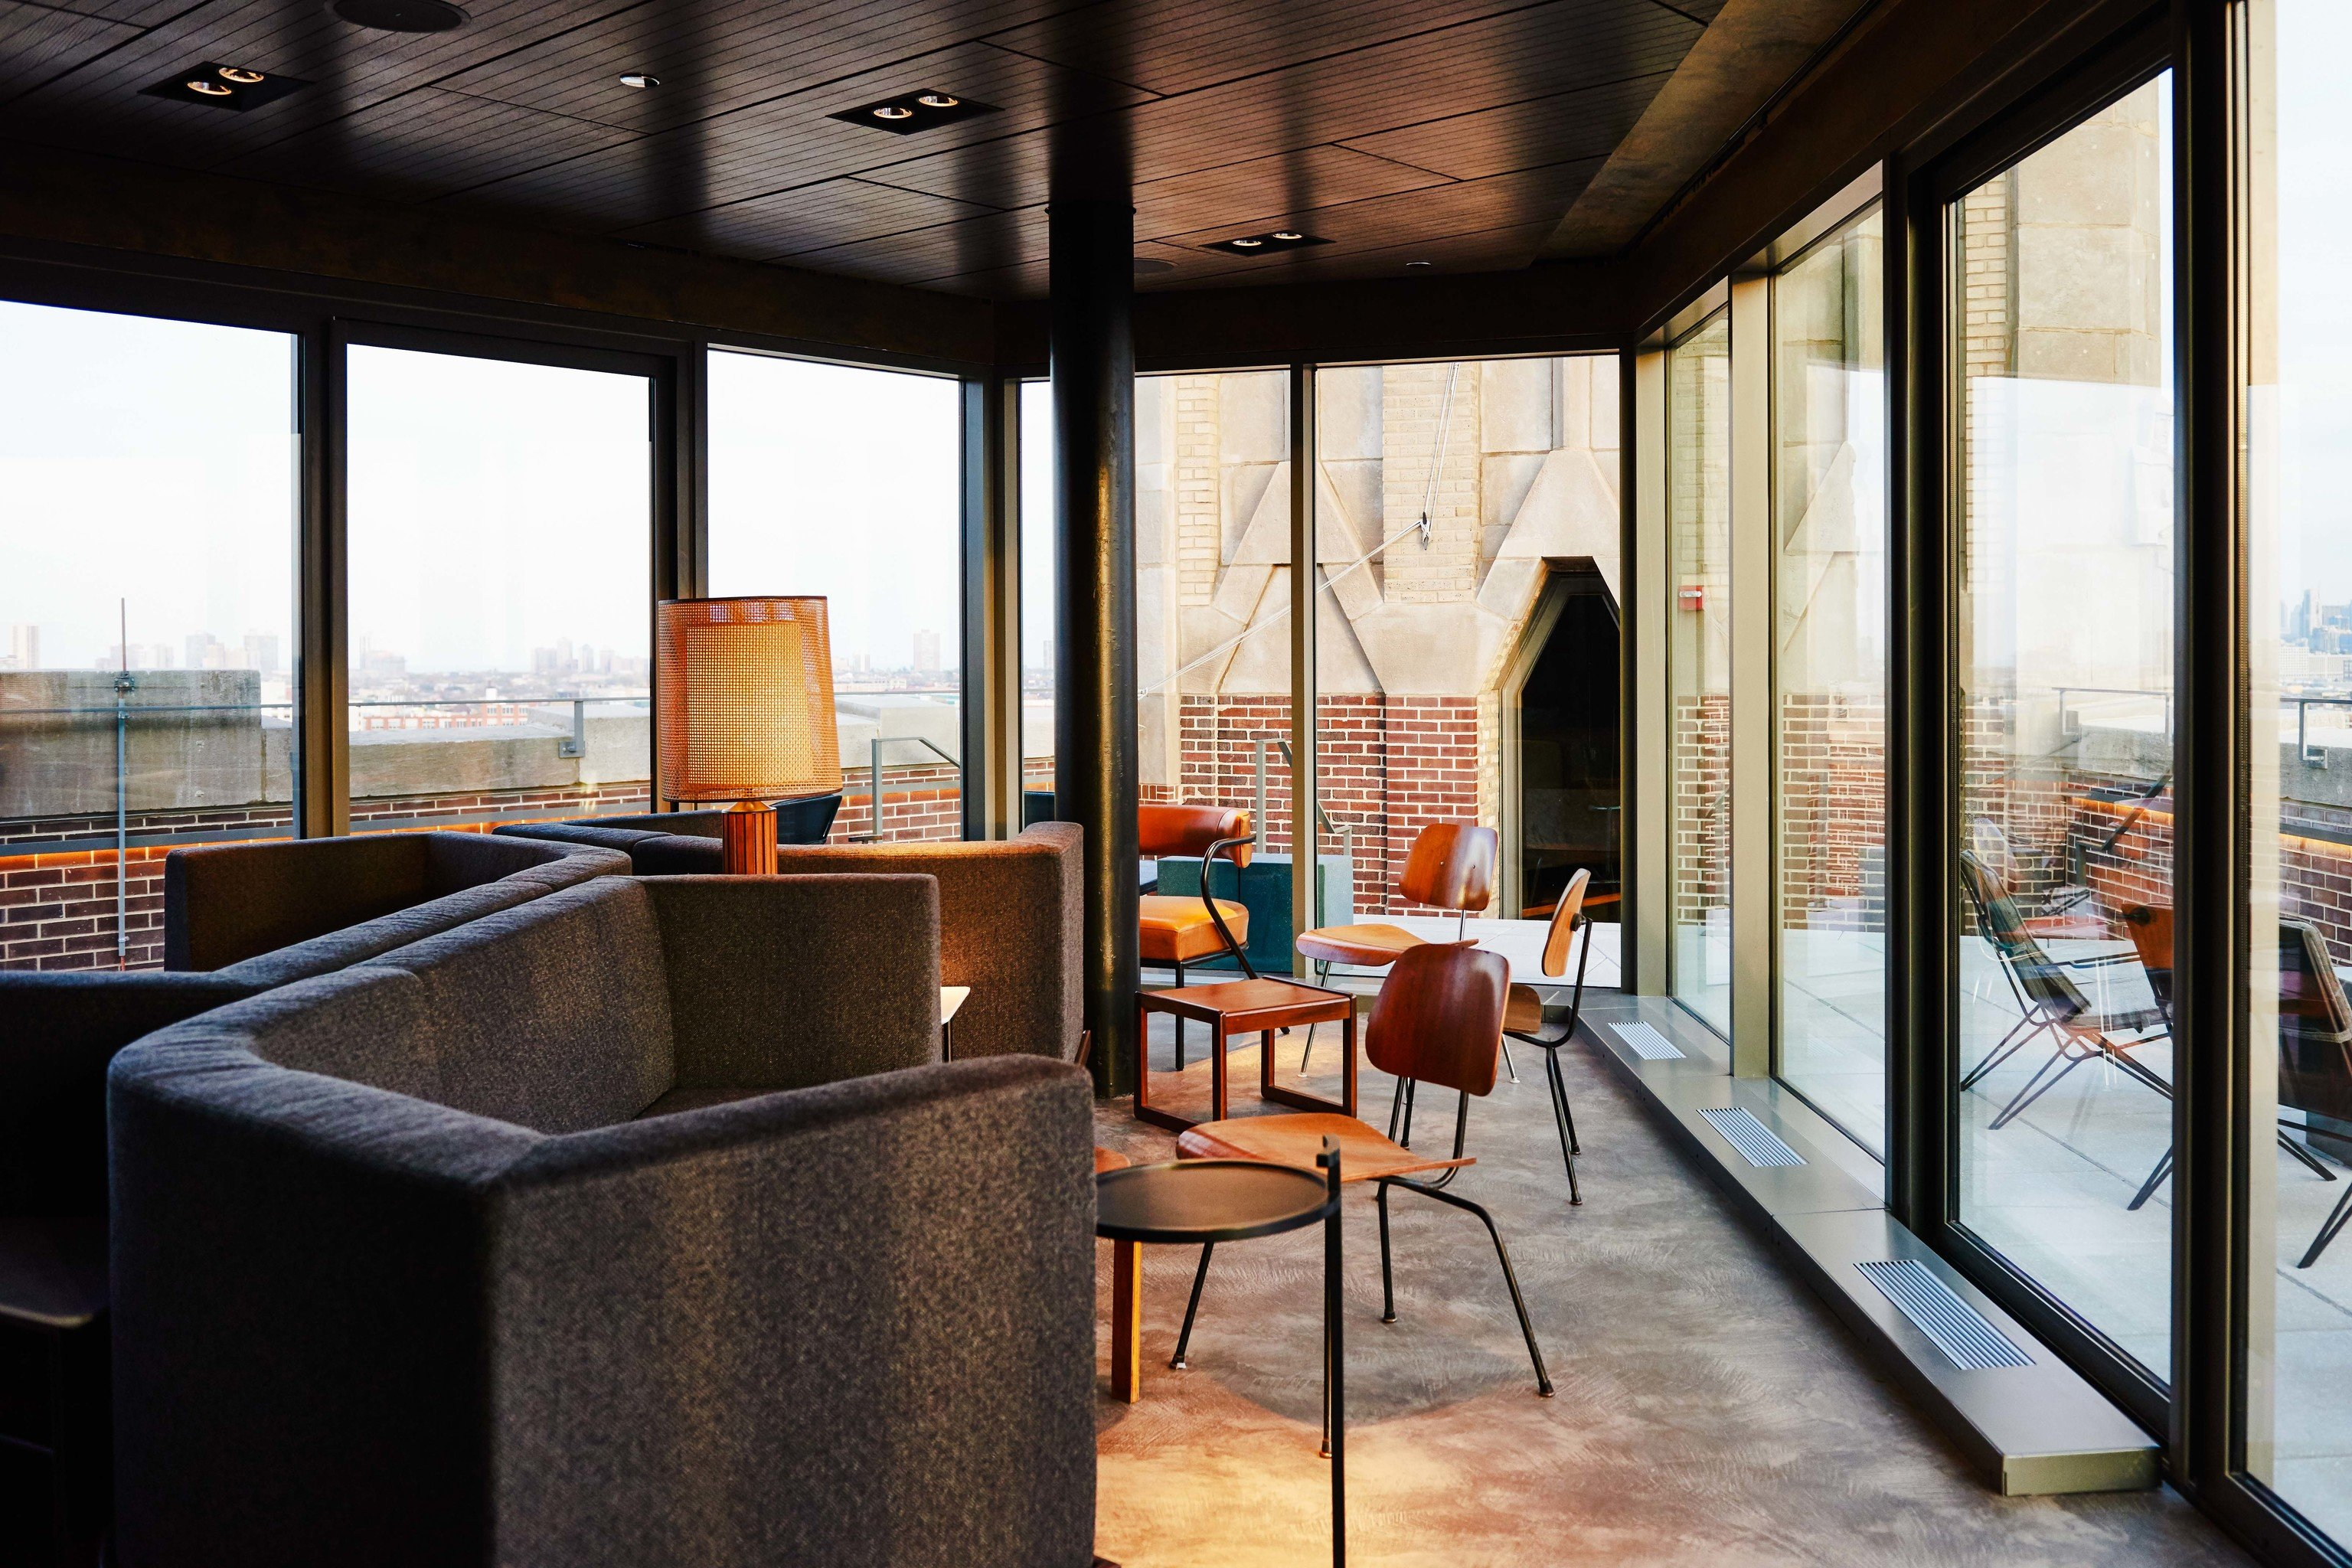 Food + Drink indoor window floor room Architecture interior design real estate loft house apartment daylighting overlooking furniture